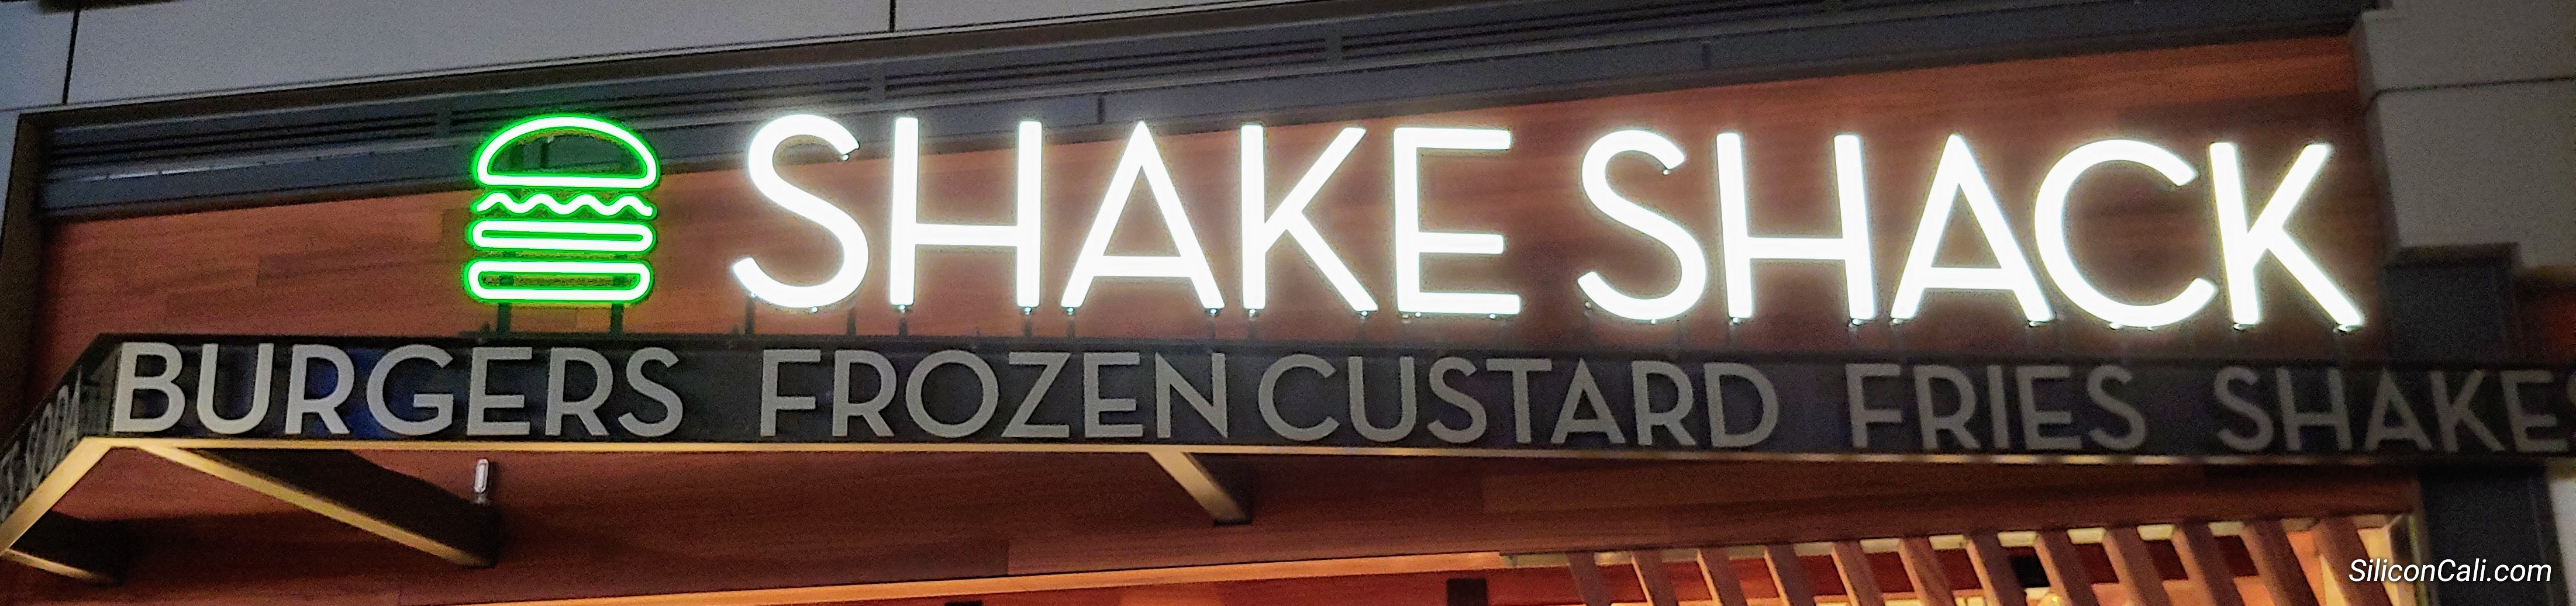 Shake_Shack_San_Mateo_sign_SiliconCali